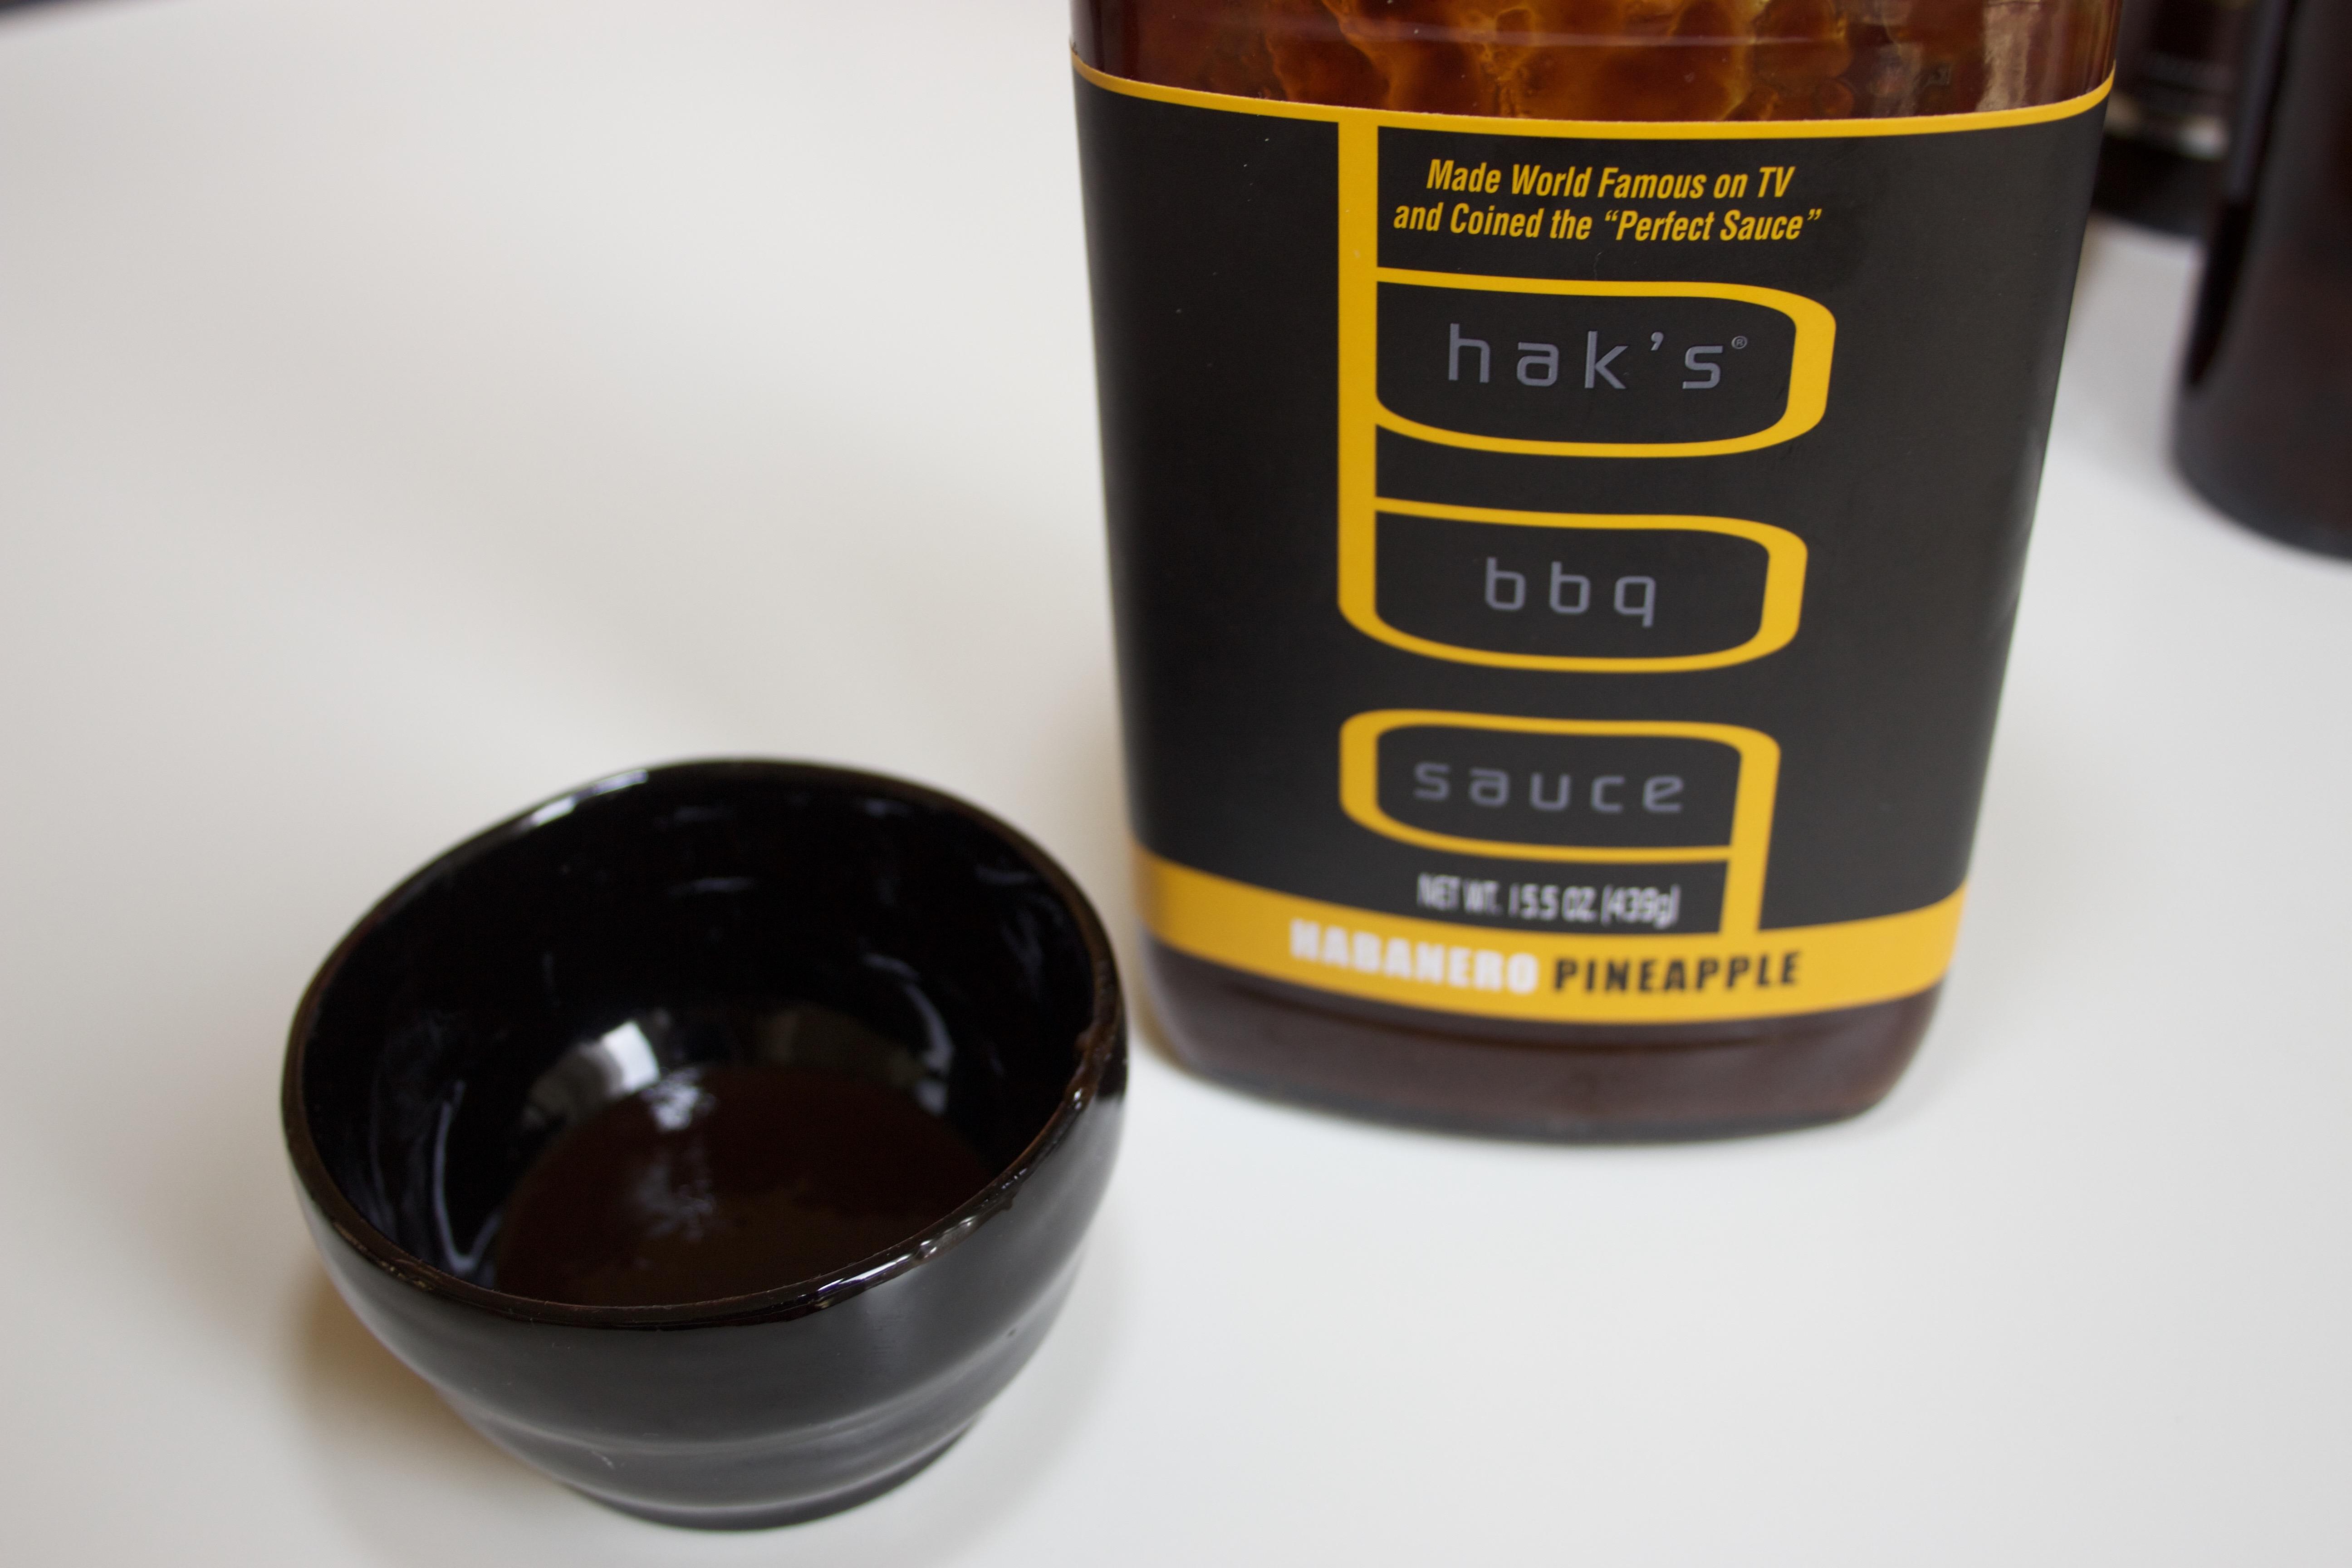 Sauce Quest Hak's BBQ